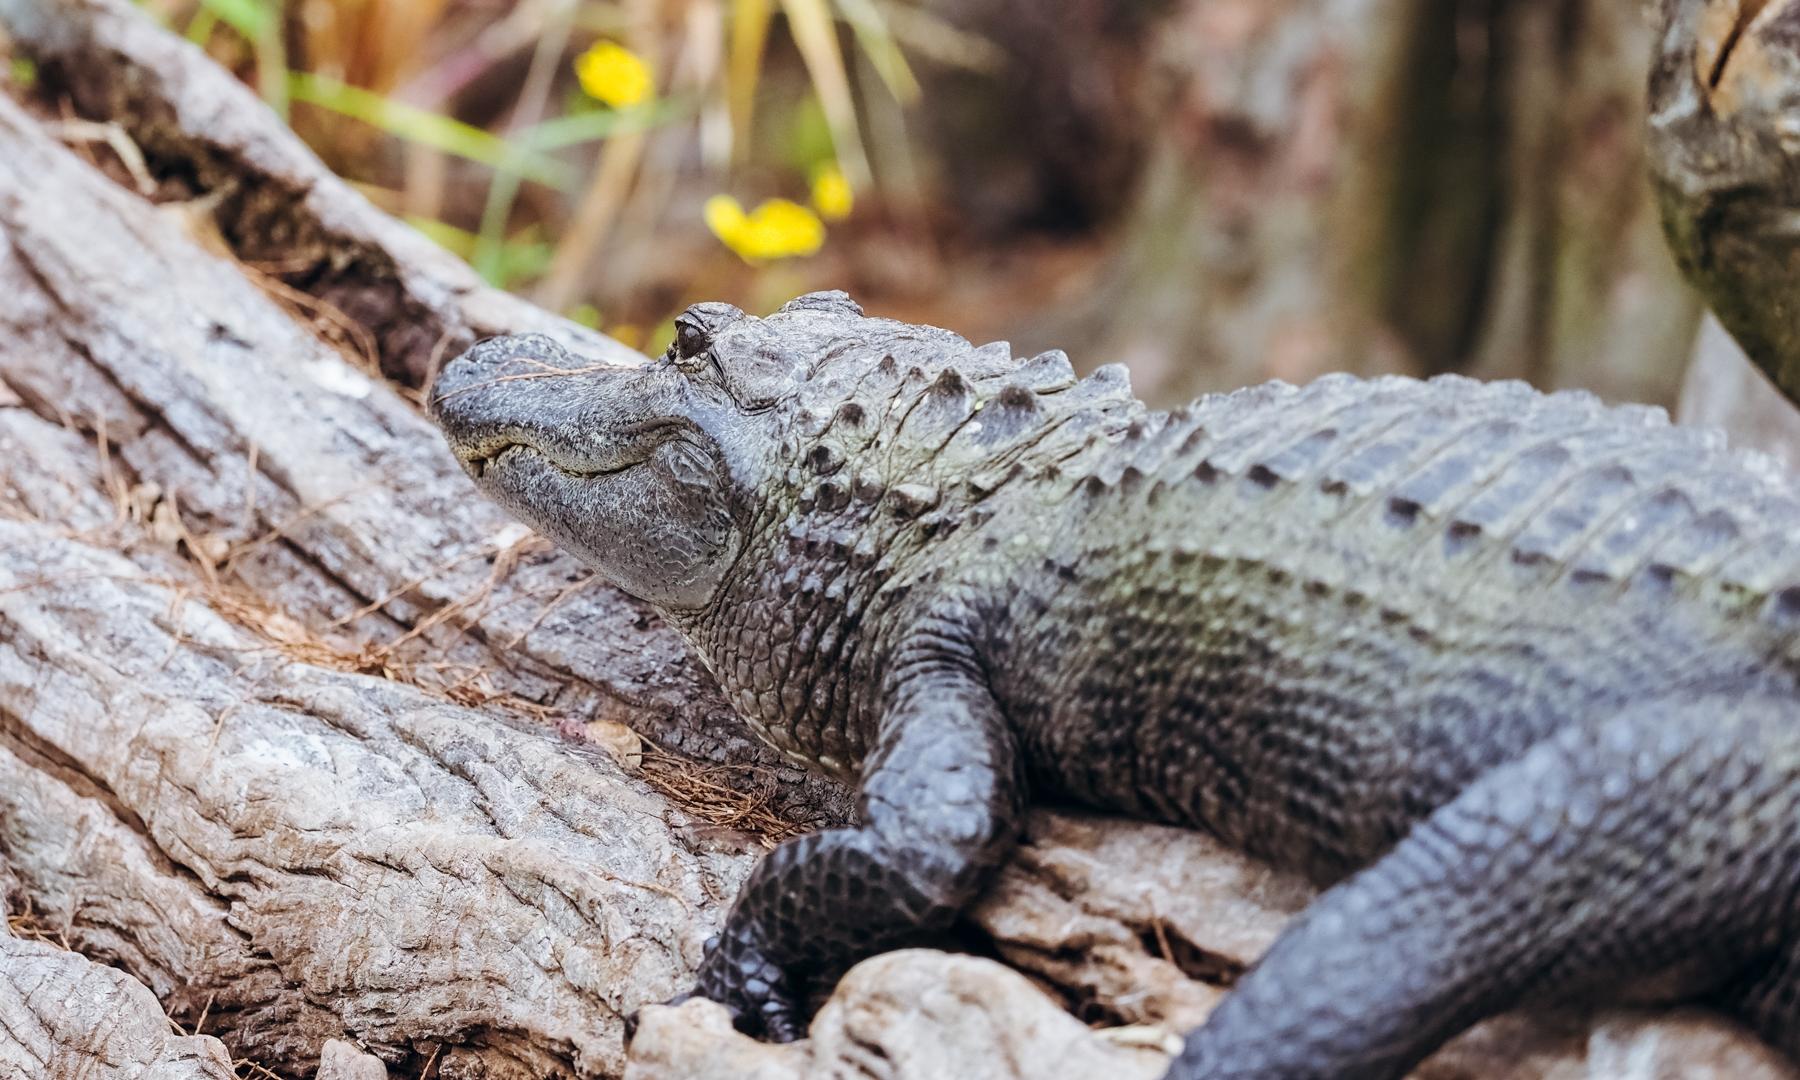 WBrawley_GC_Okefenokee16-Wildlife-117.jpg